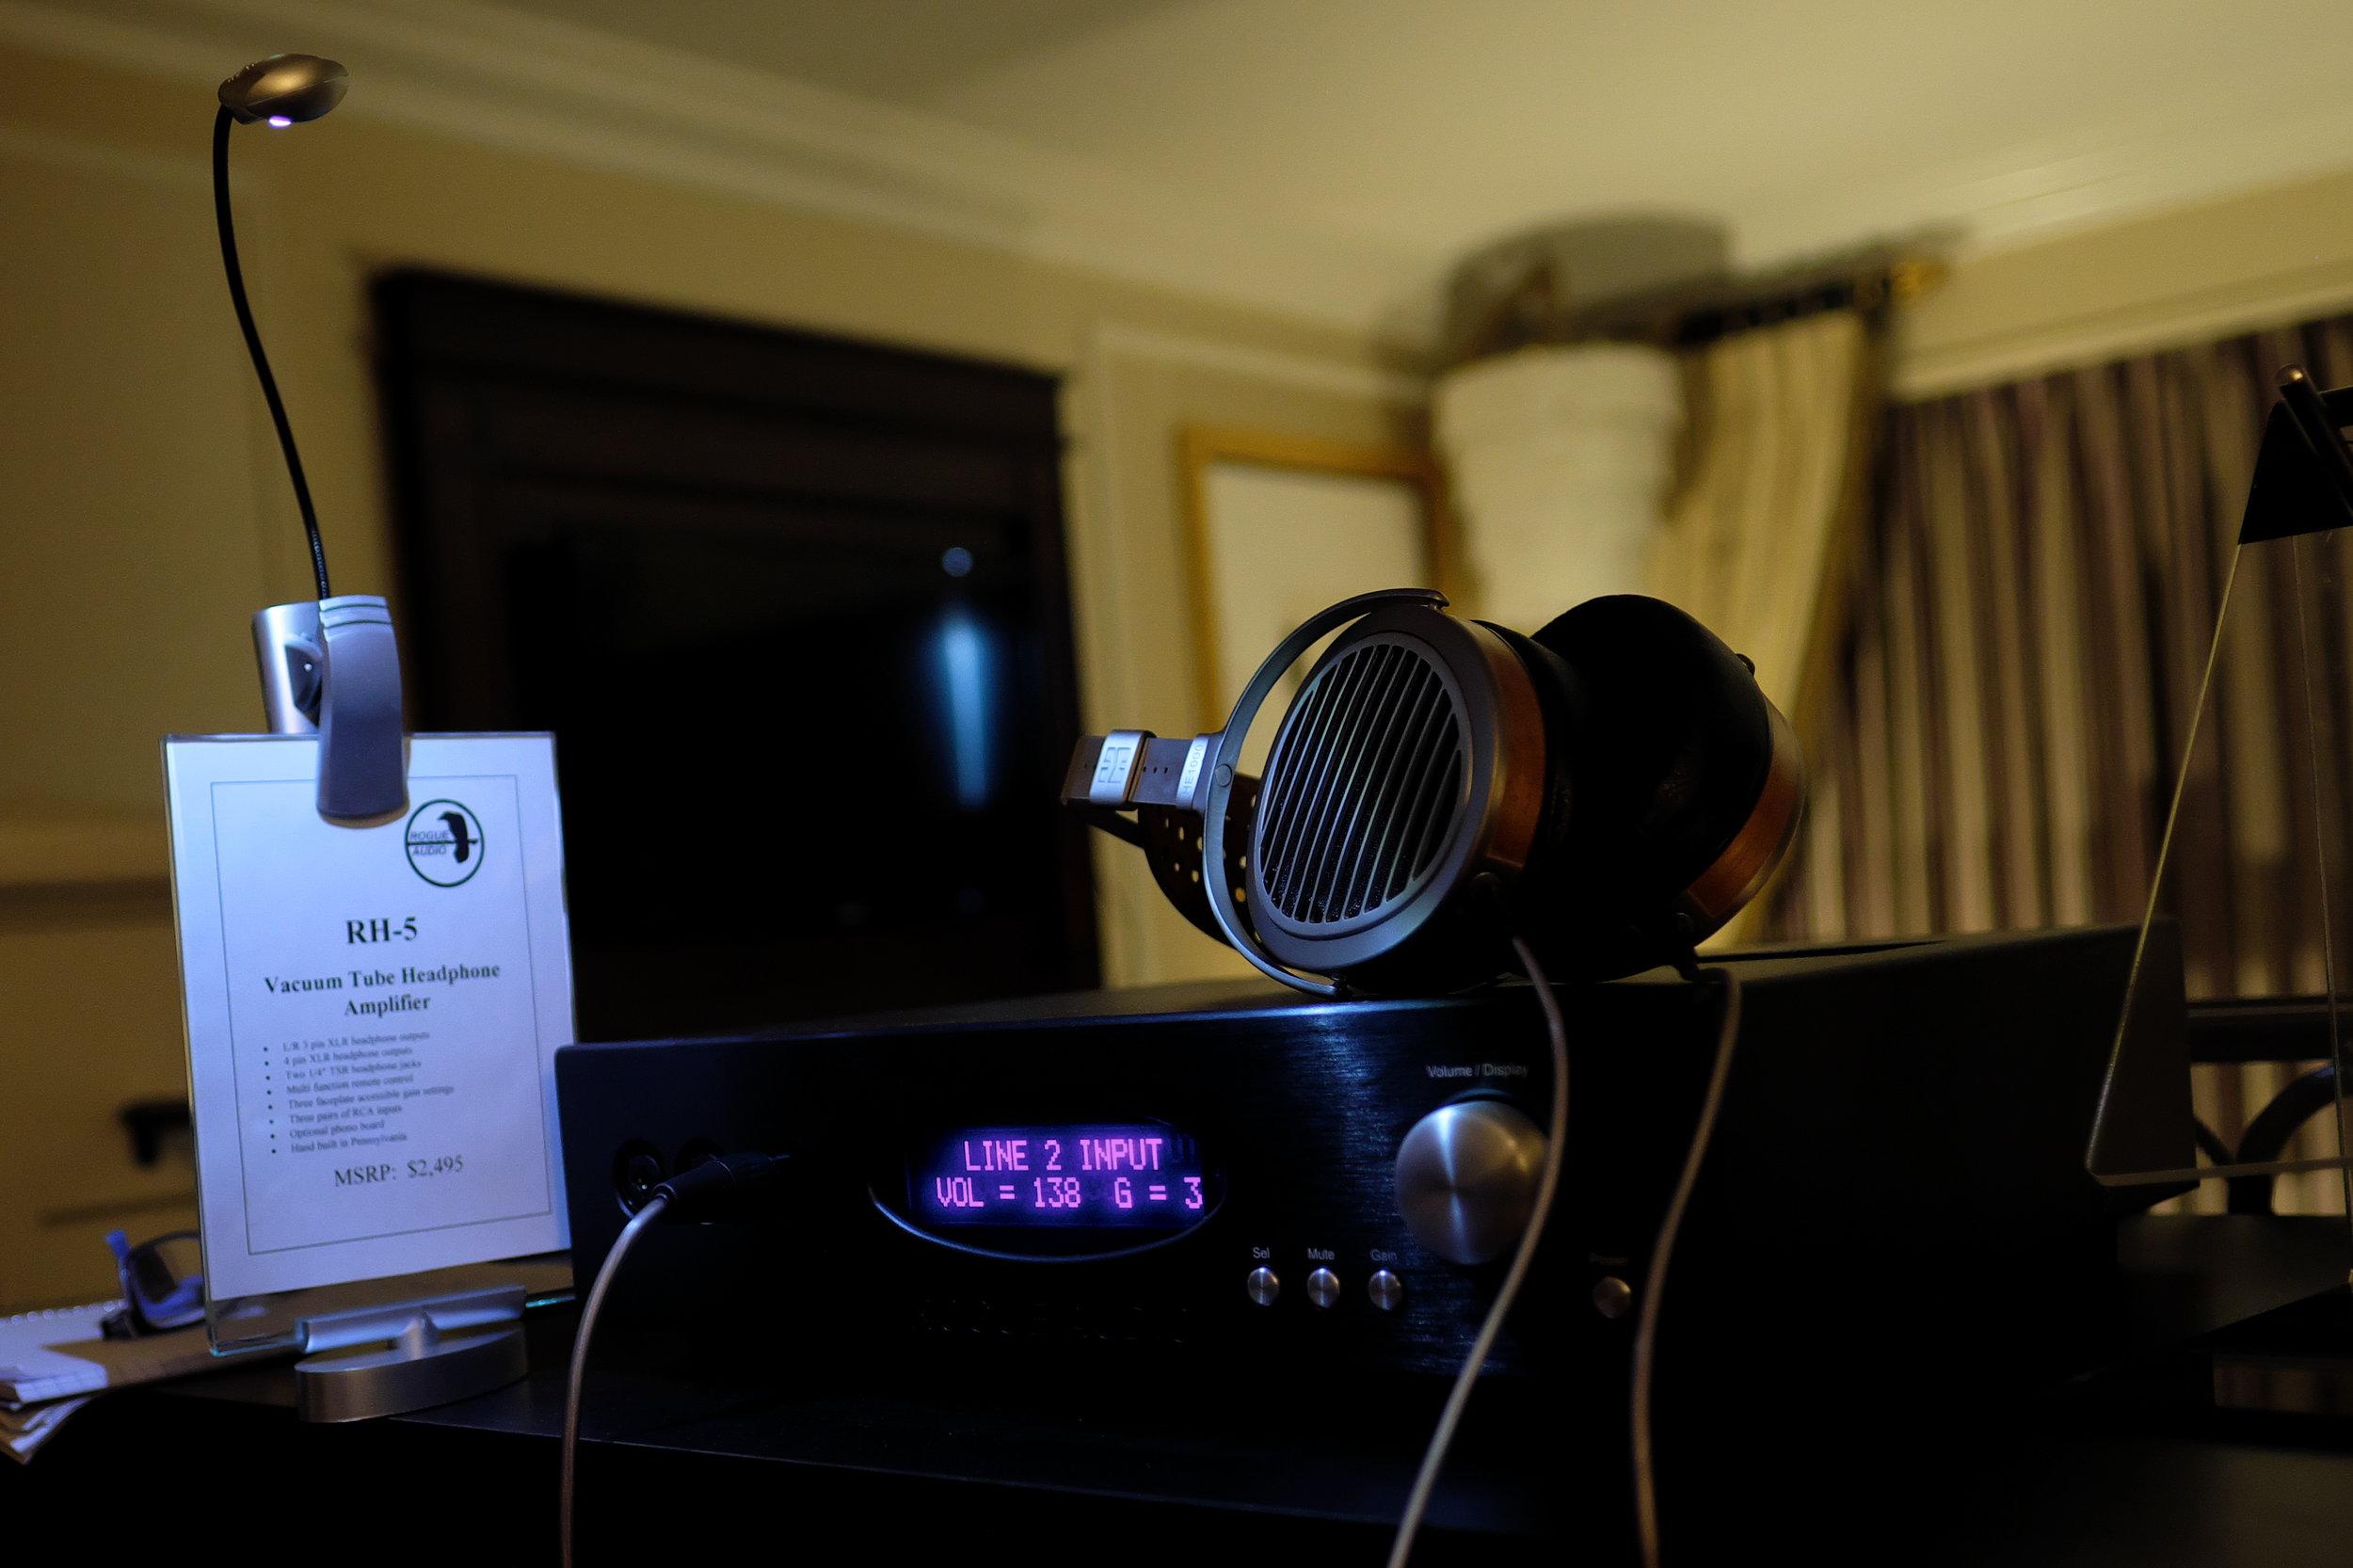 HiFiMan HE1000 headphones hooked up to a Rogue Audio RH-5 headphone amp.